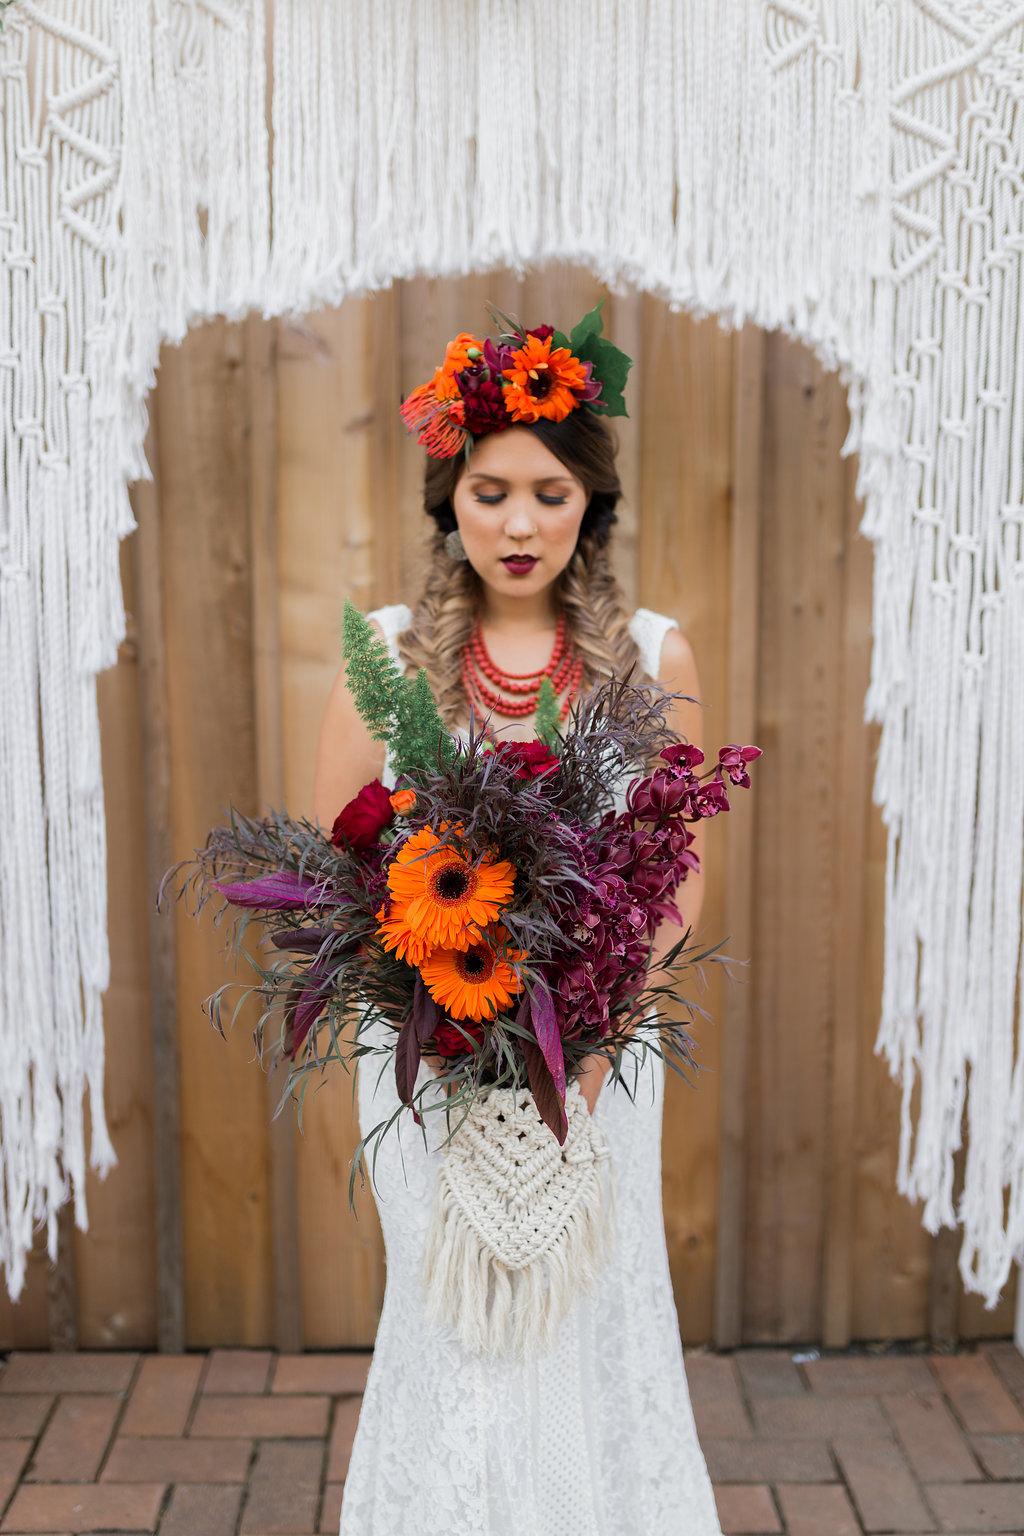 DianaB_WeddingTrends_2018_207.jpg